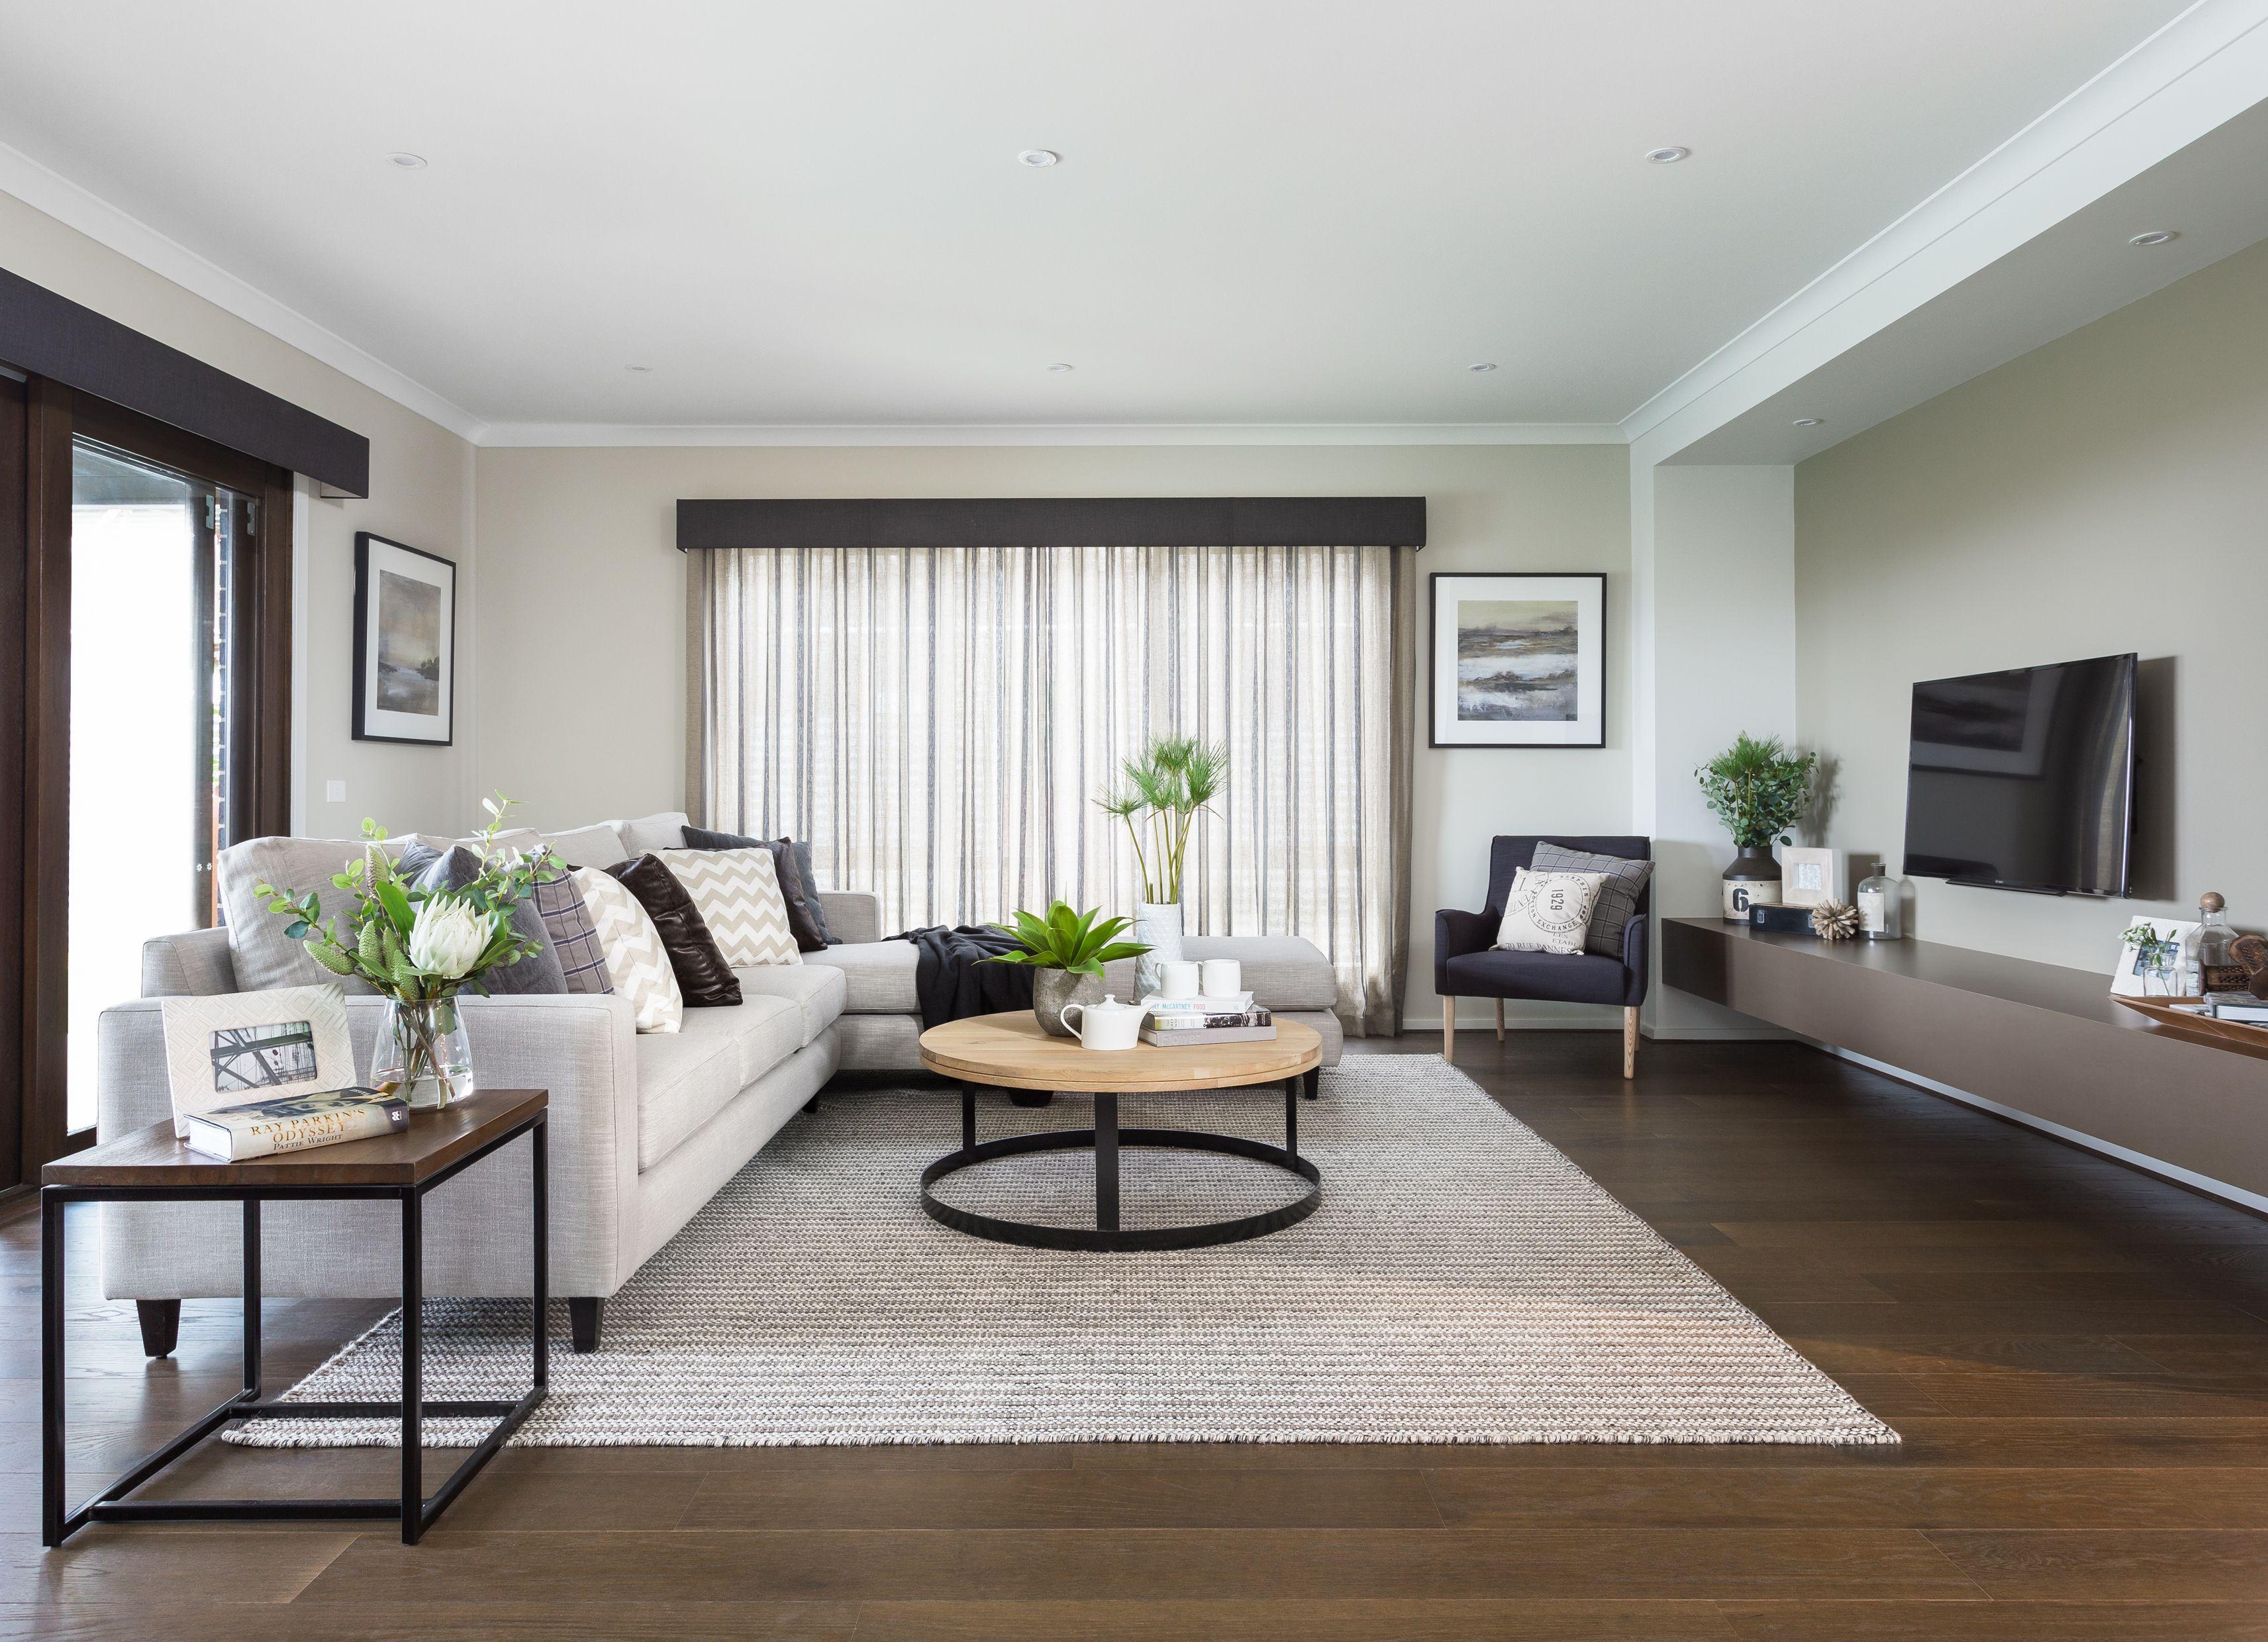 Living Room Image By زوبعة في فنجان Lounge Room Styling Living